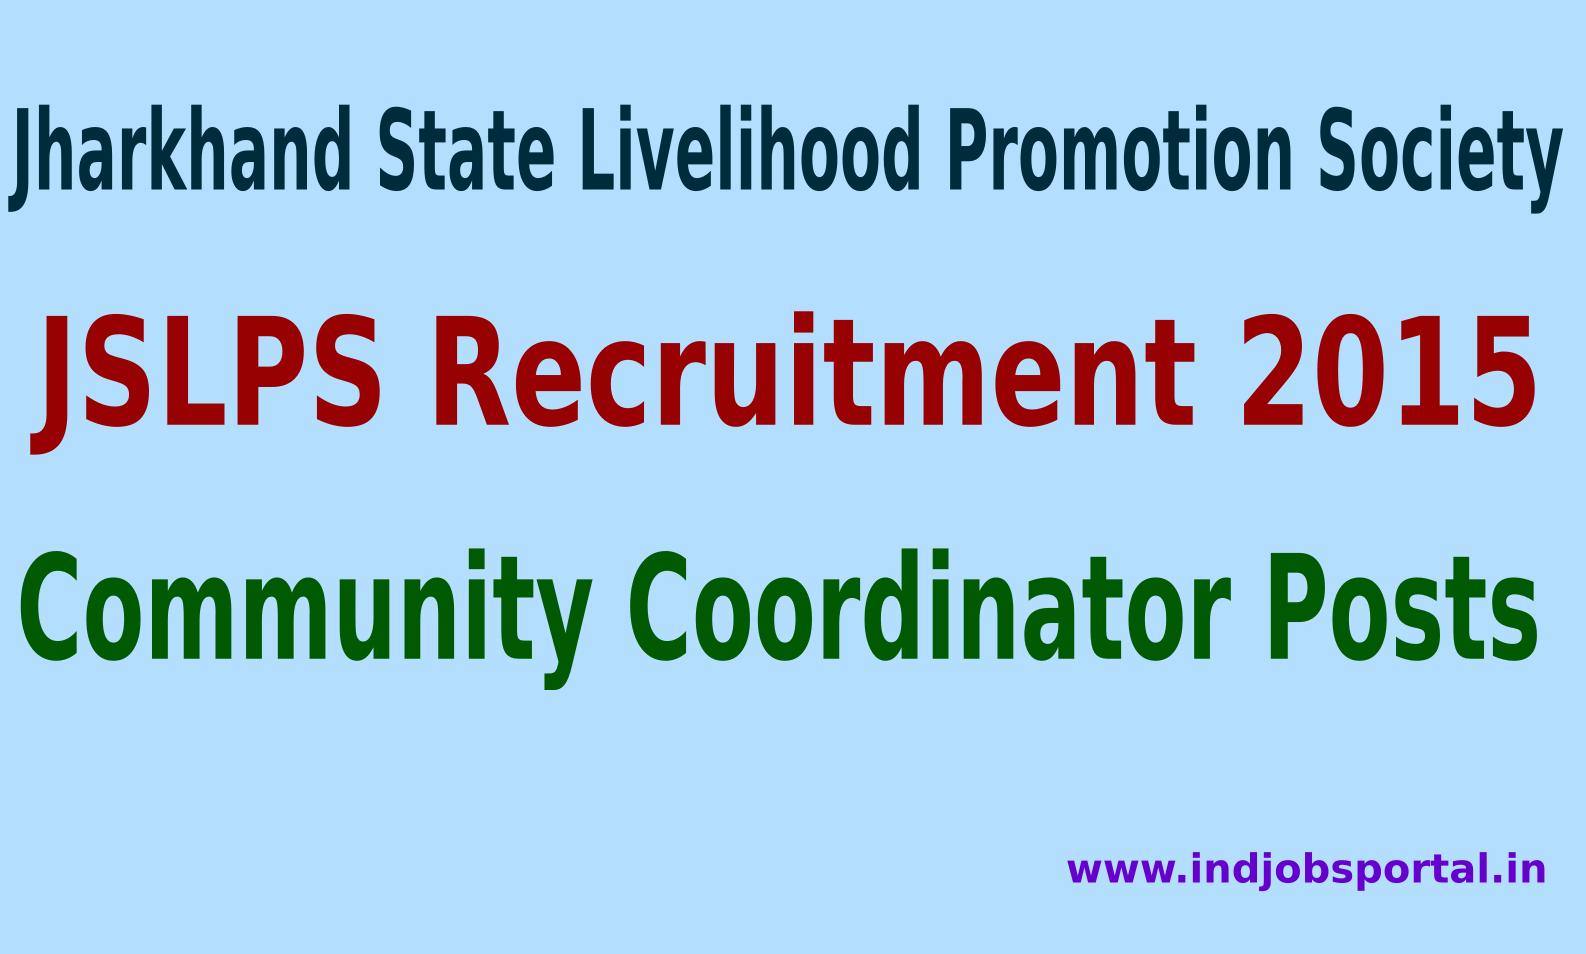 JSLPS Recruitment 2015 For 365 Community Coordinator Posts